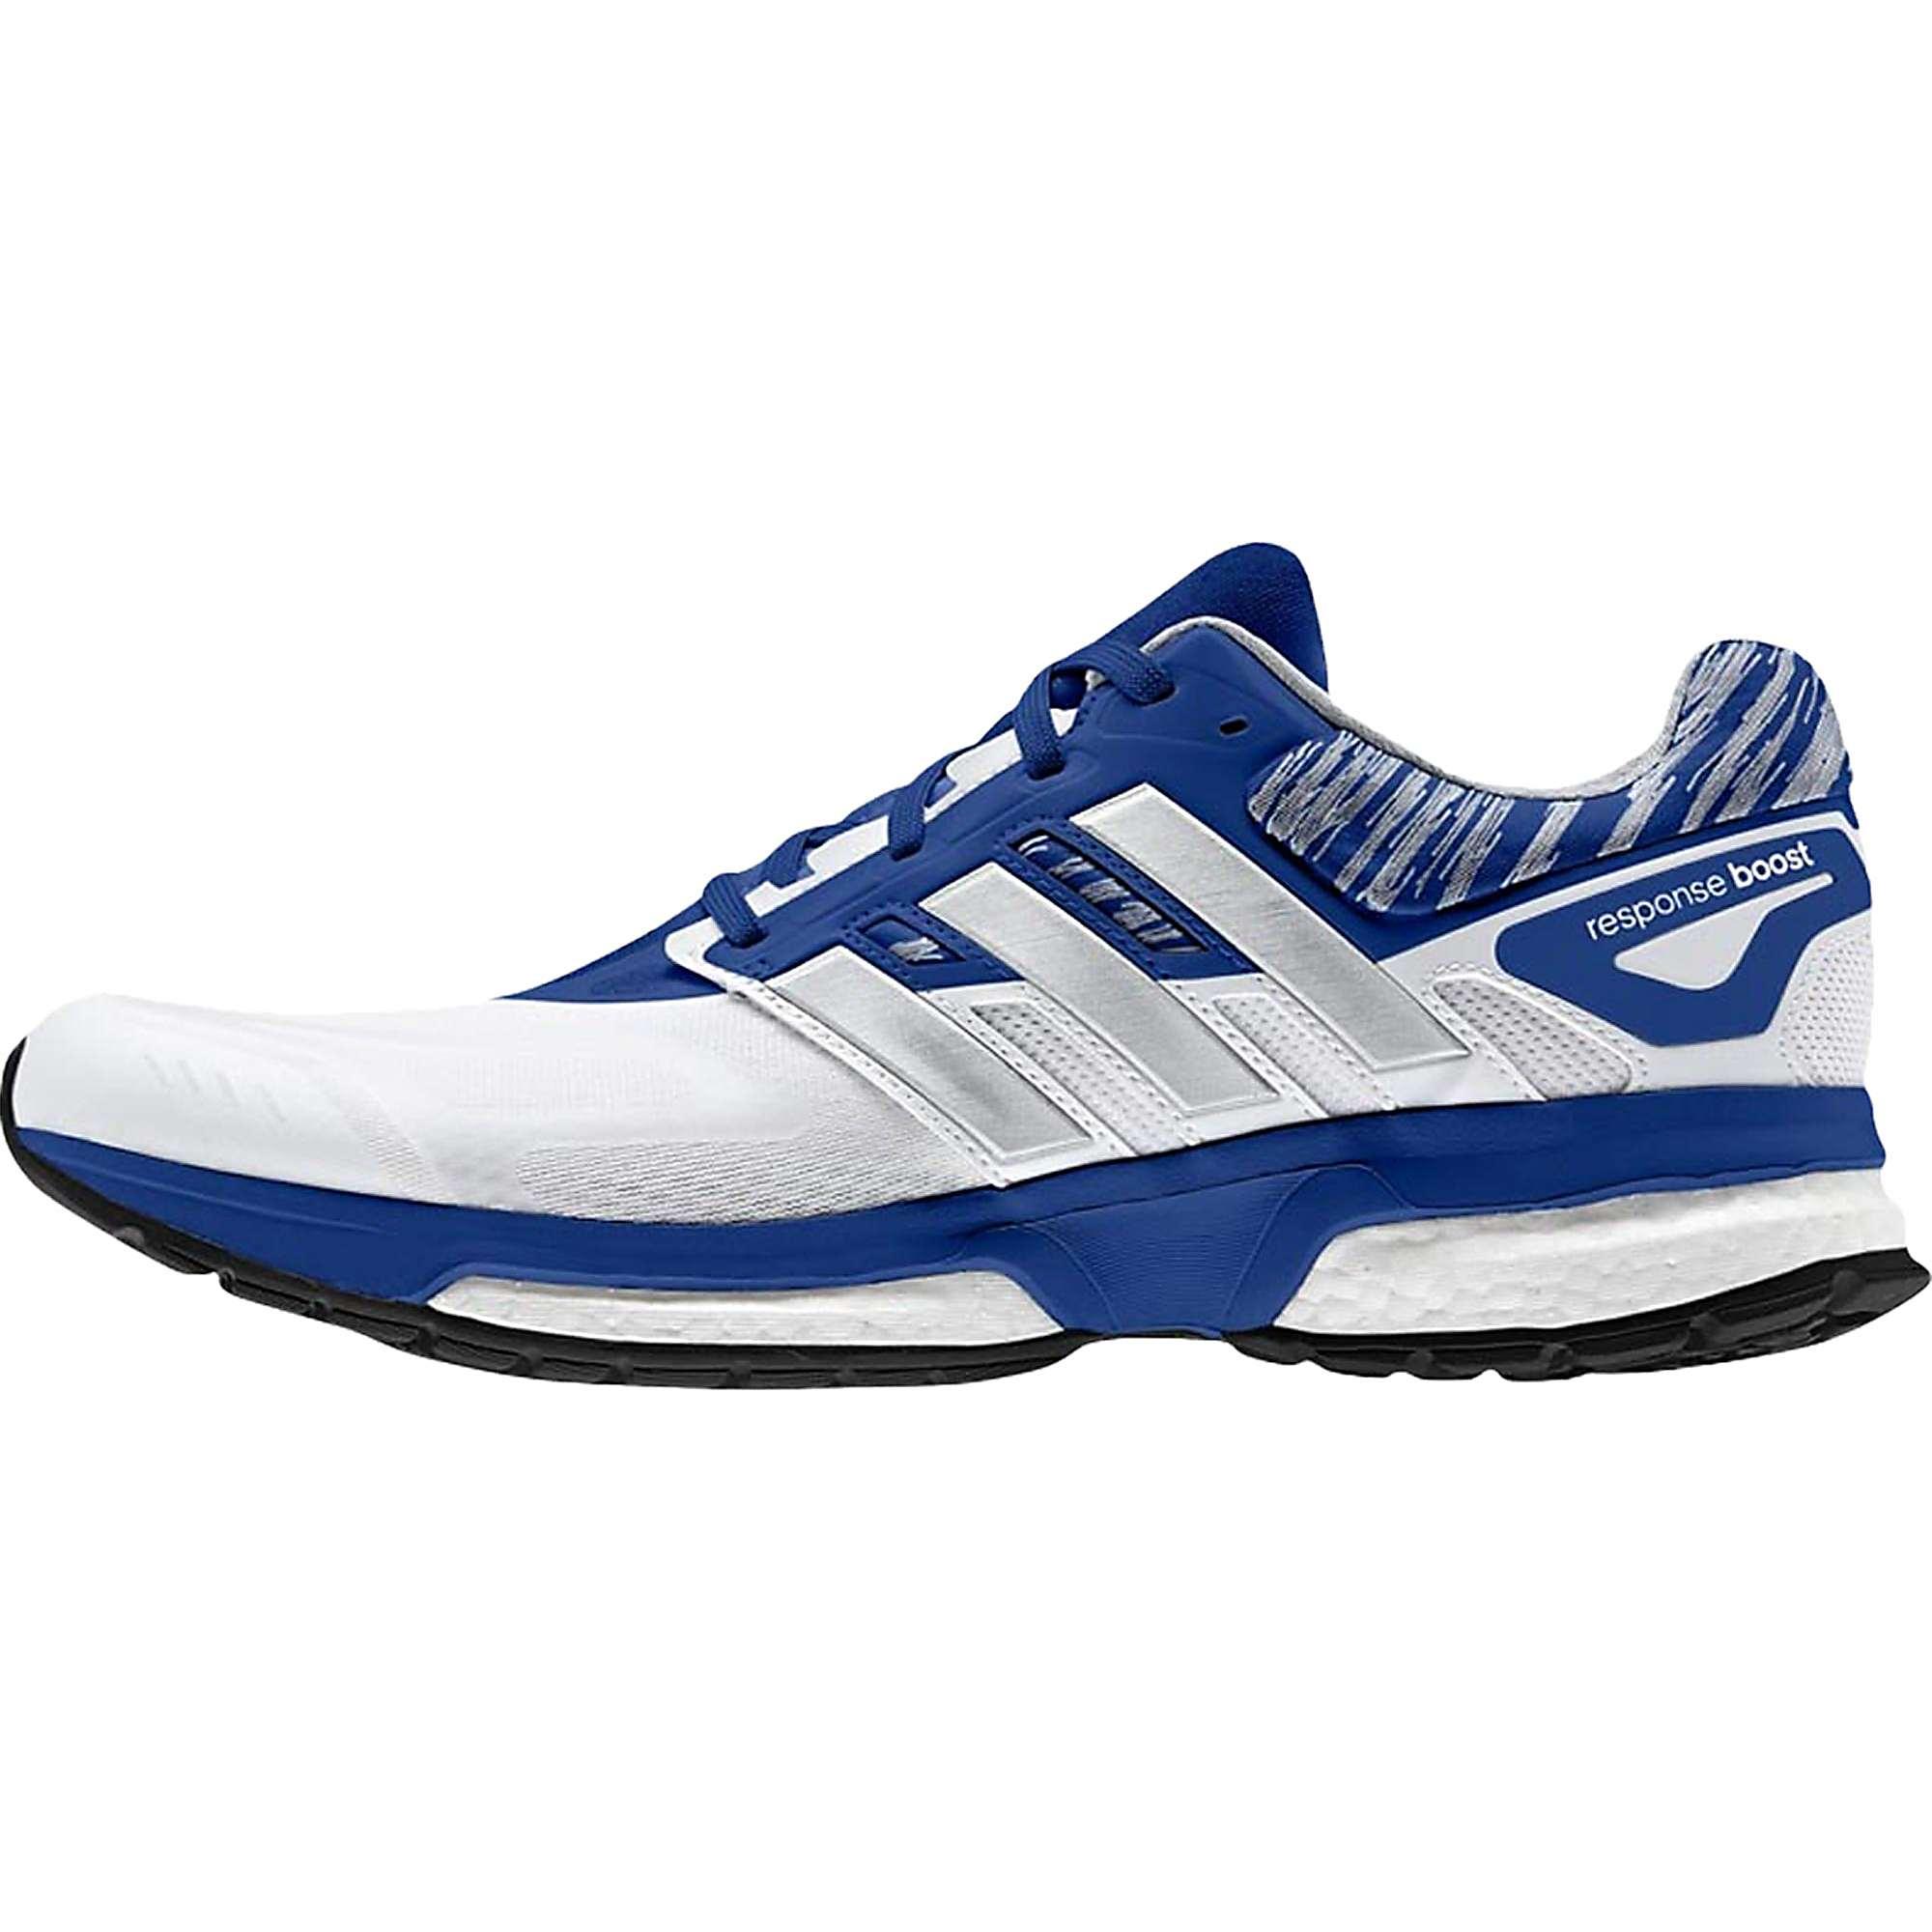 Adidas Men's Response Boost Techfit Running Shoe | eBay